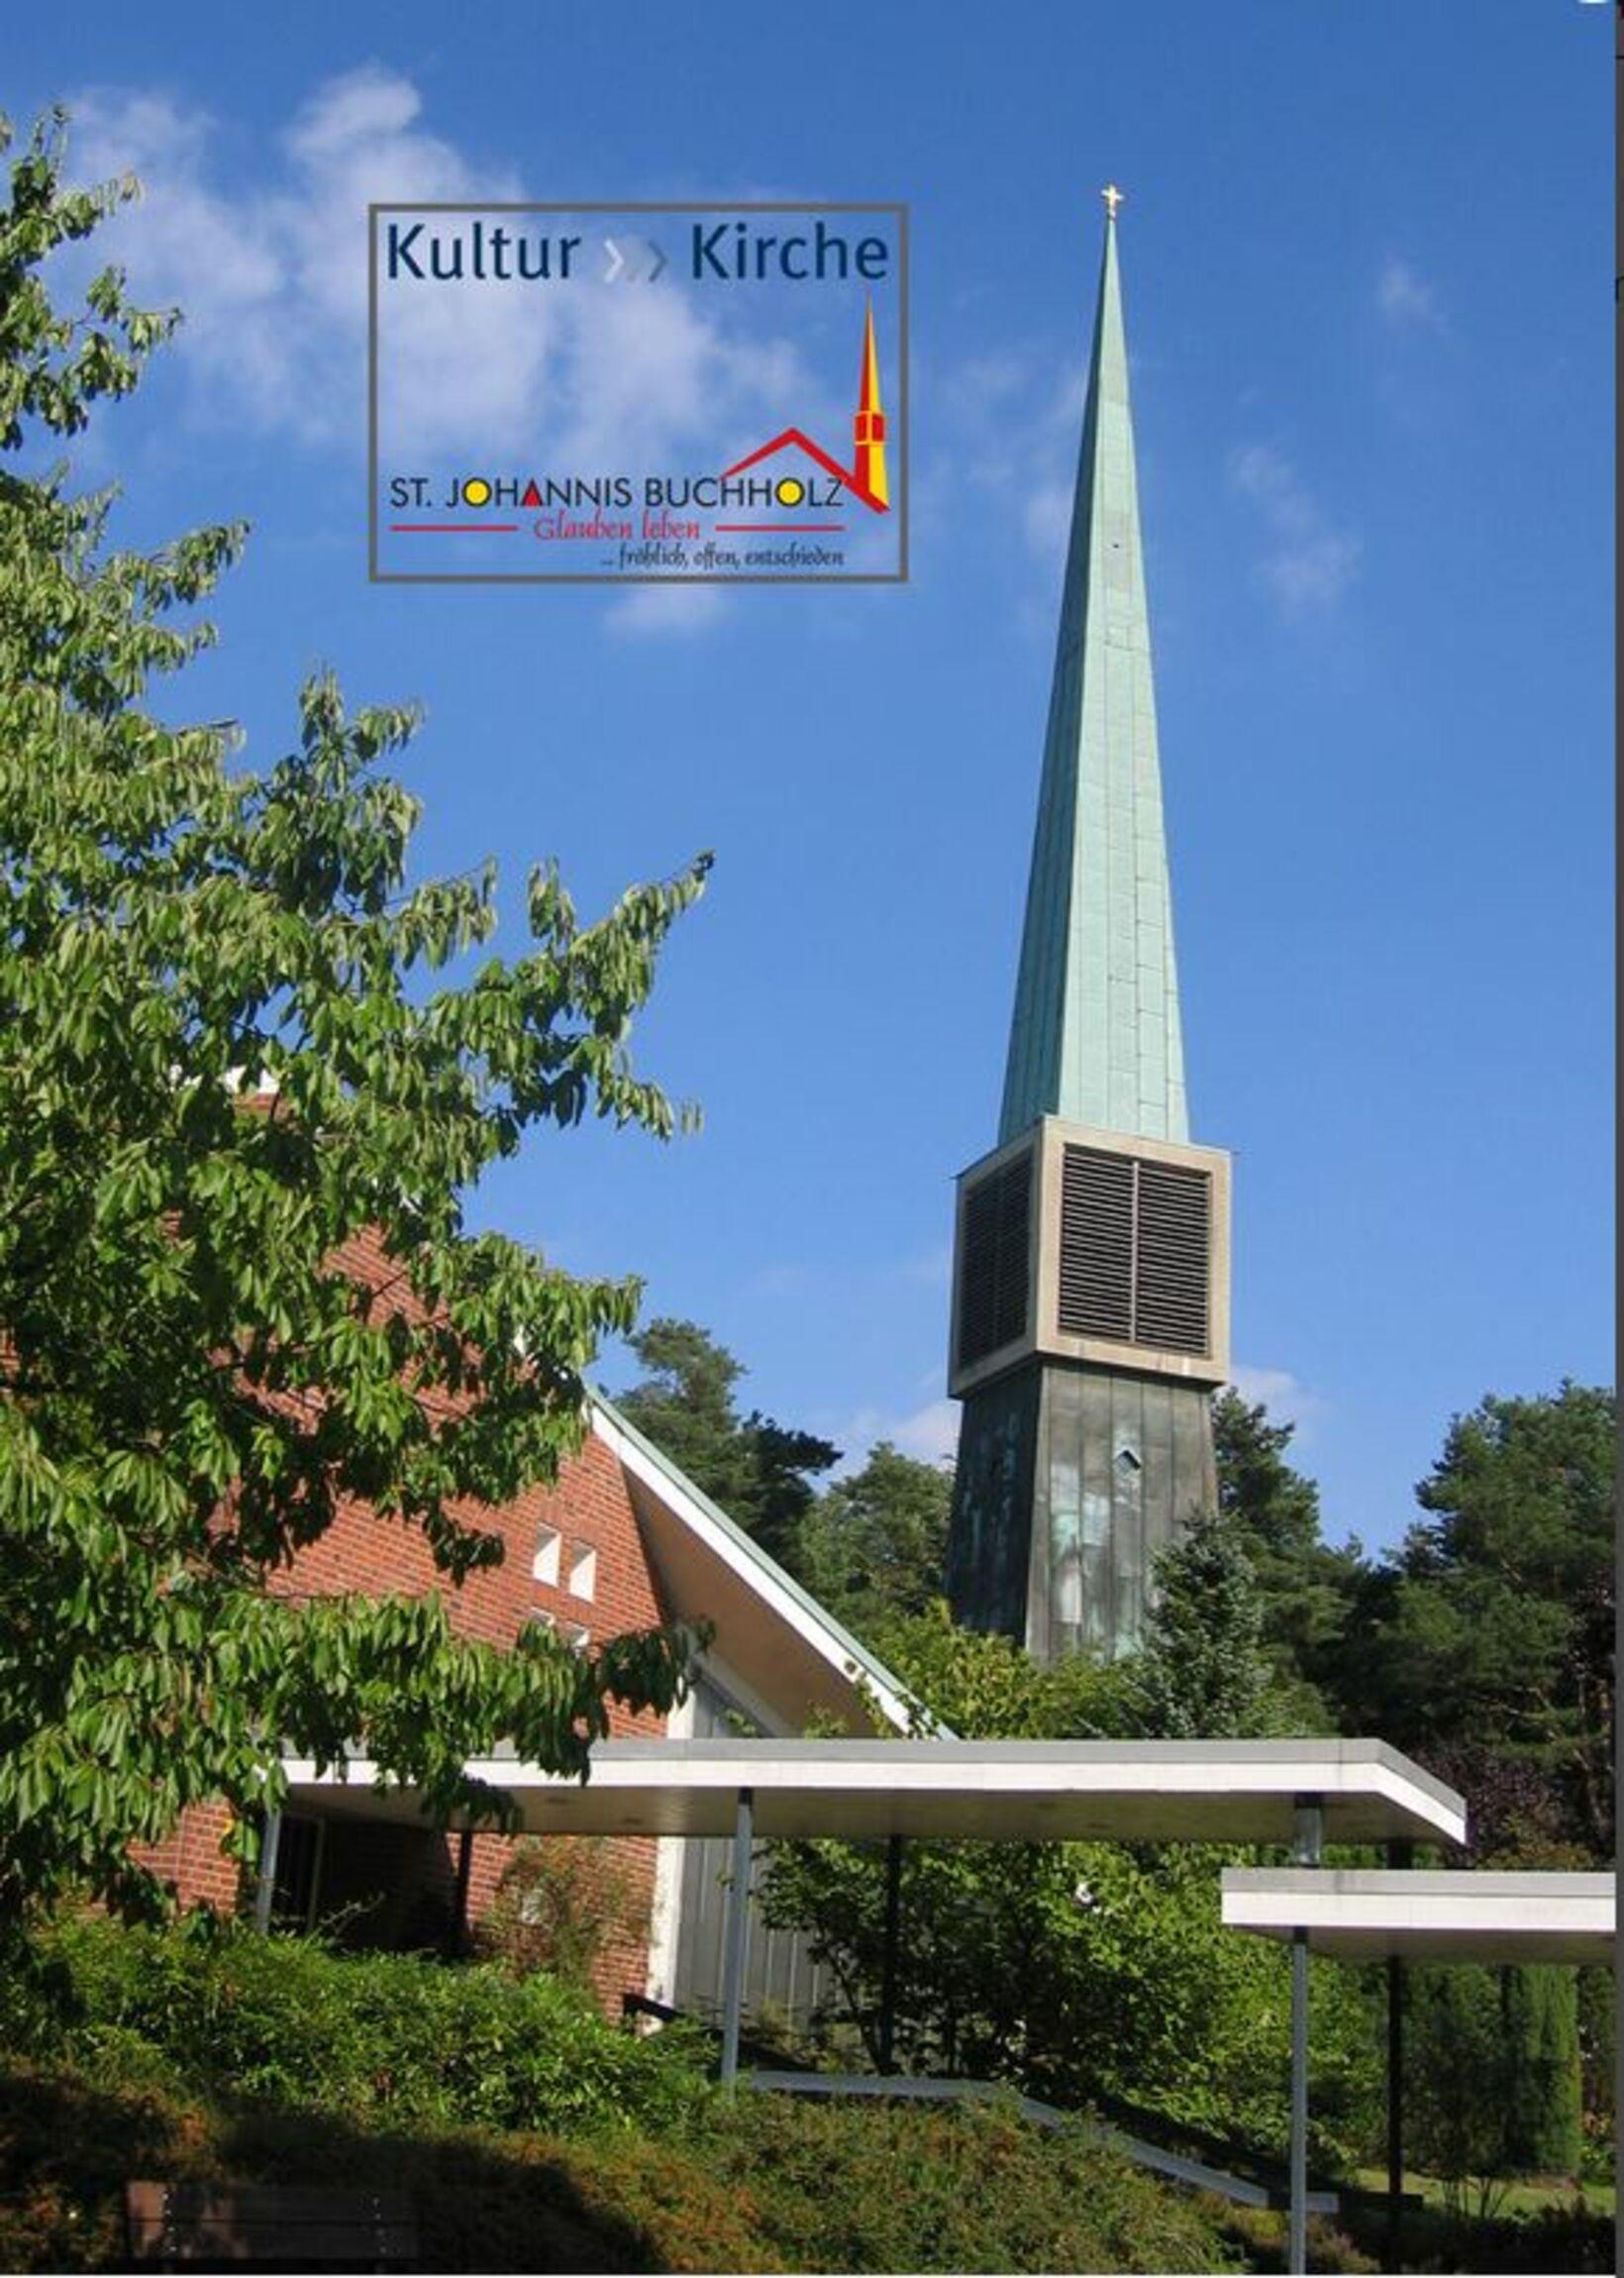 Foto: St. Johannis, Buchholz